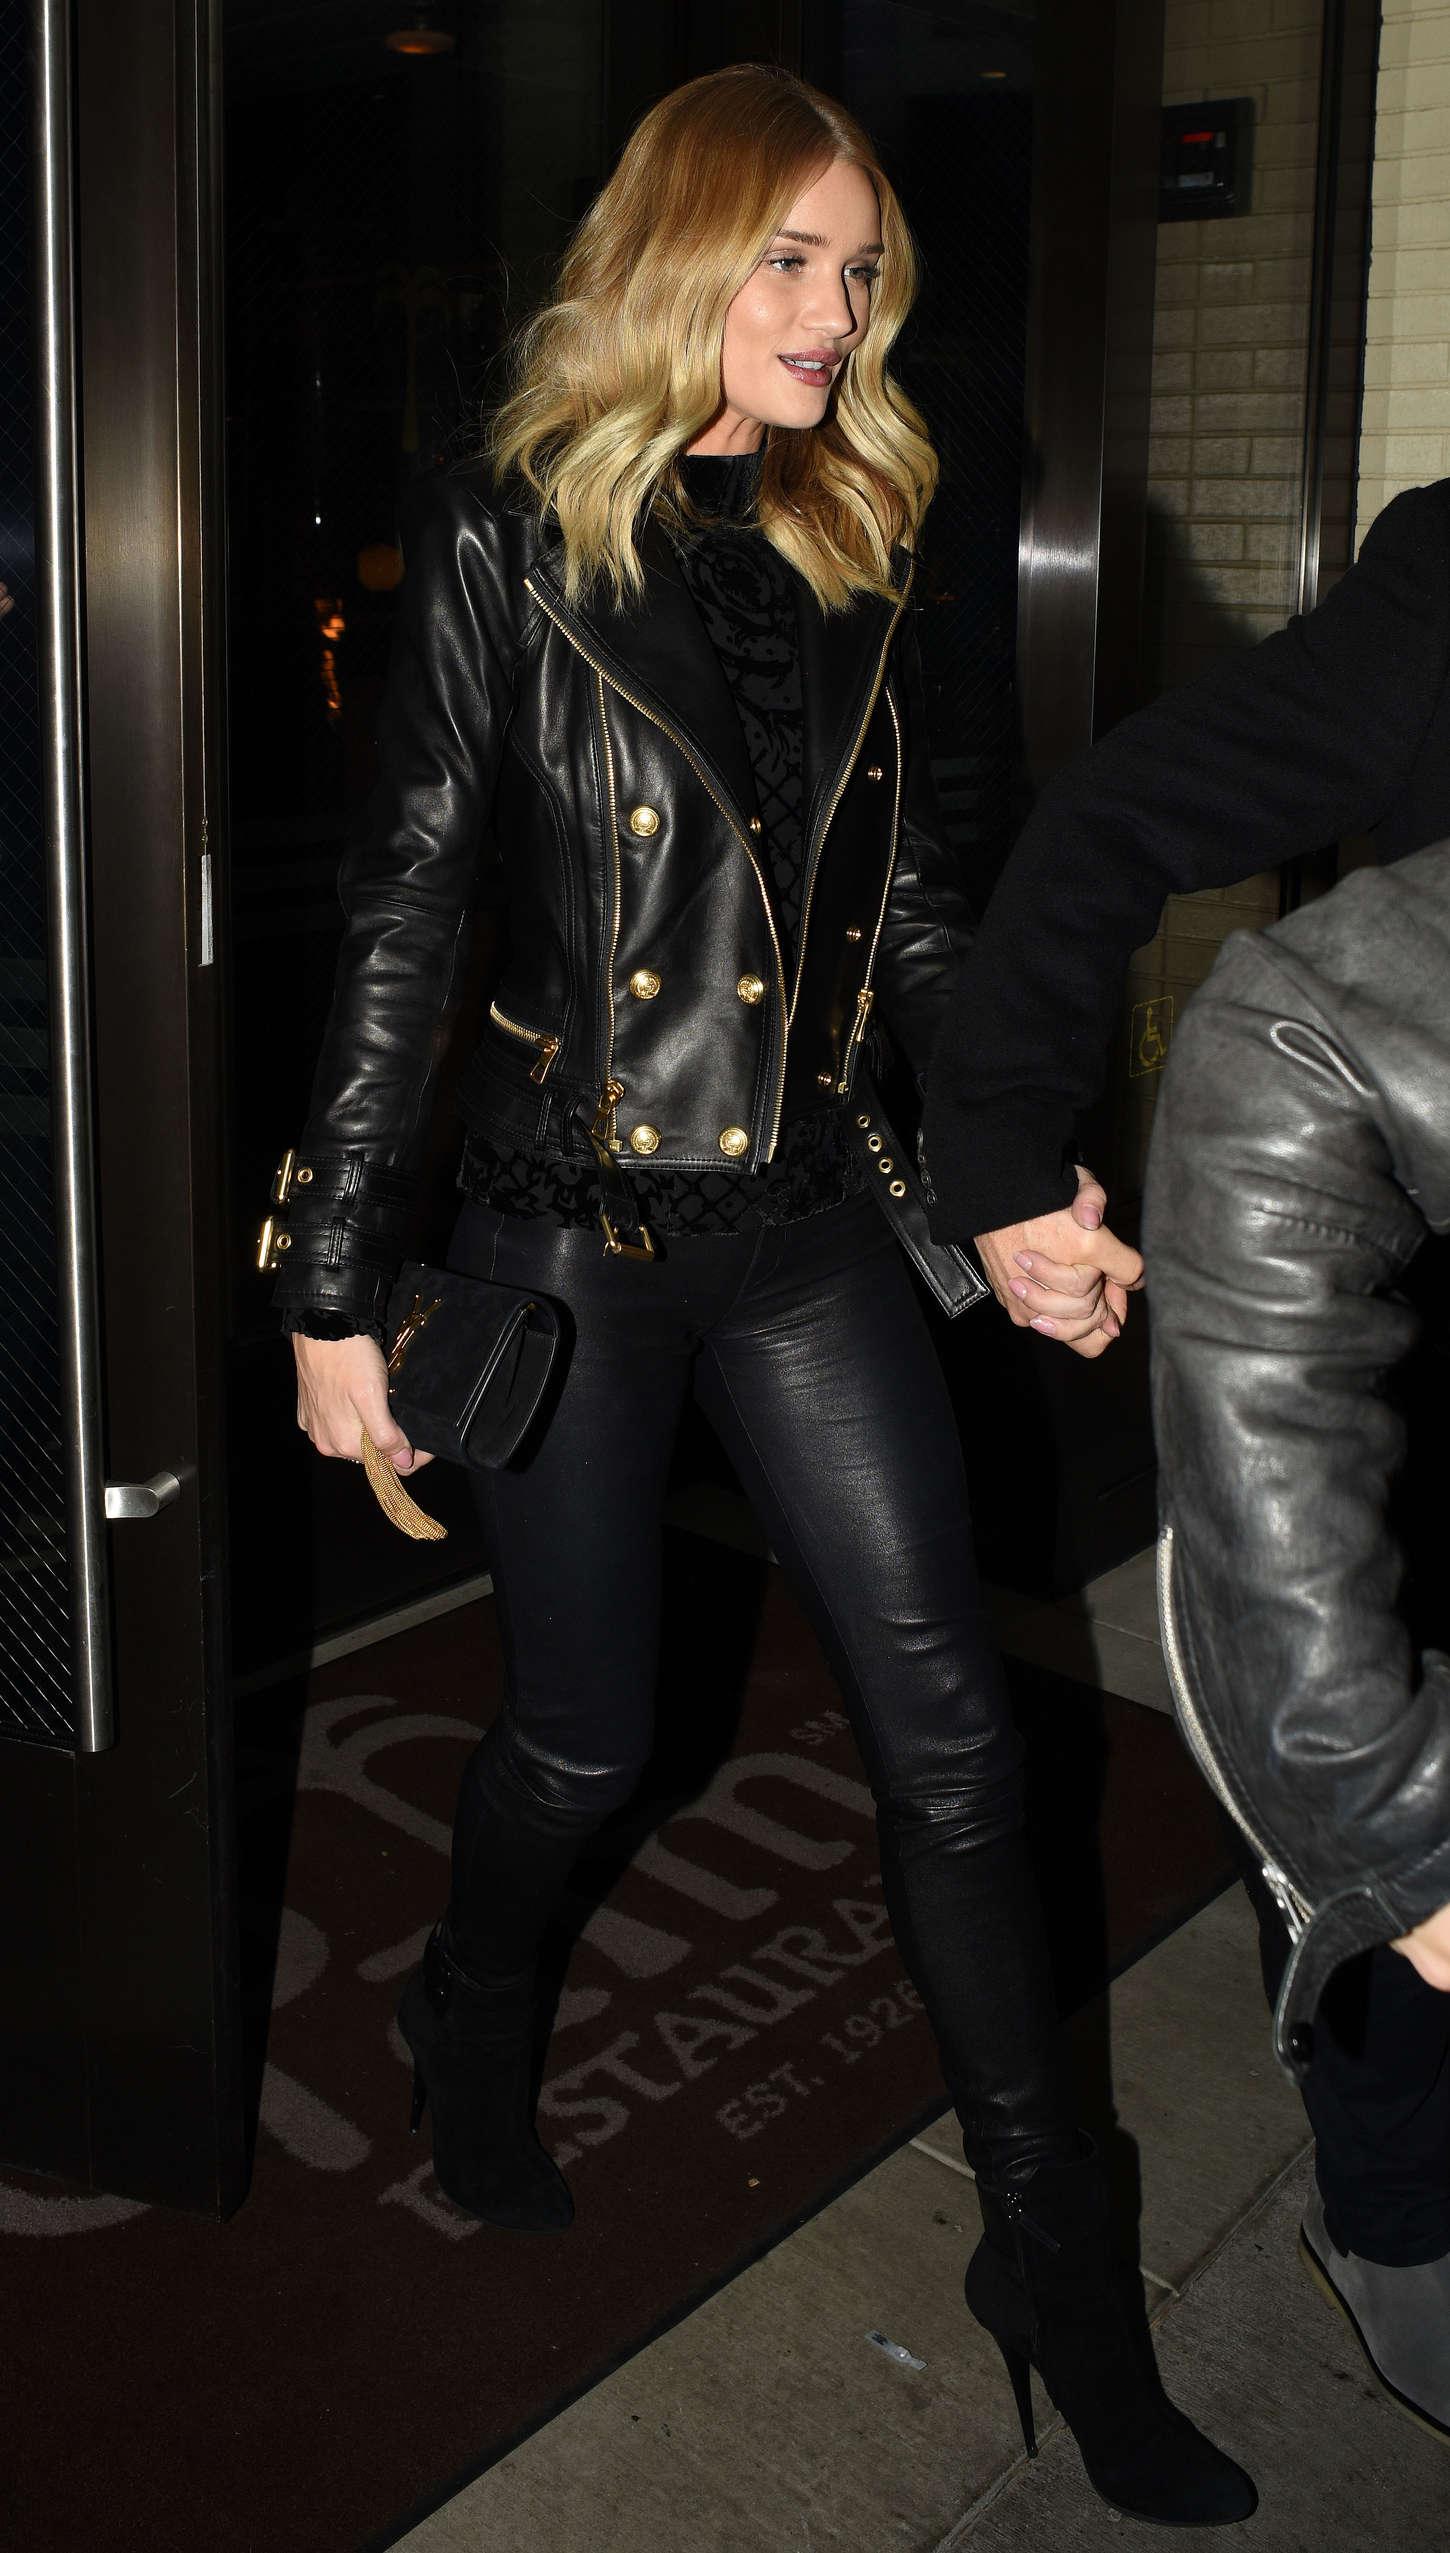 Rosie Huntington Whiteley In Leather Pants 06 Gotceleb